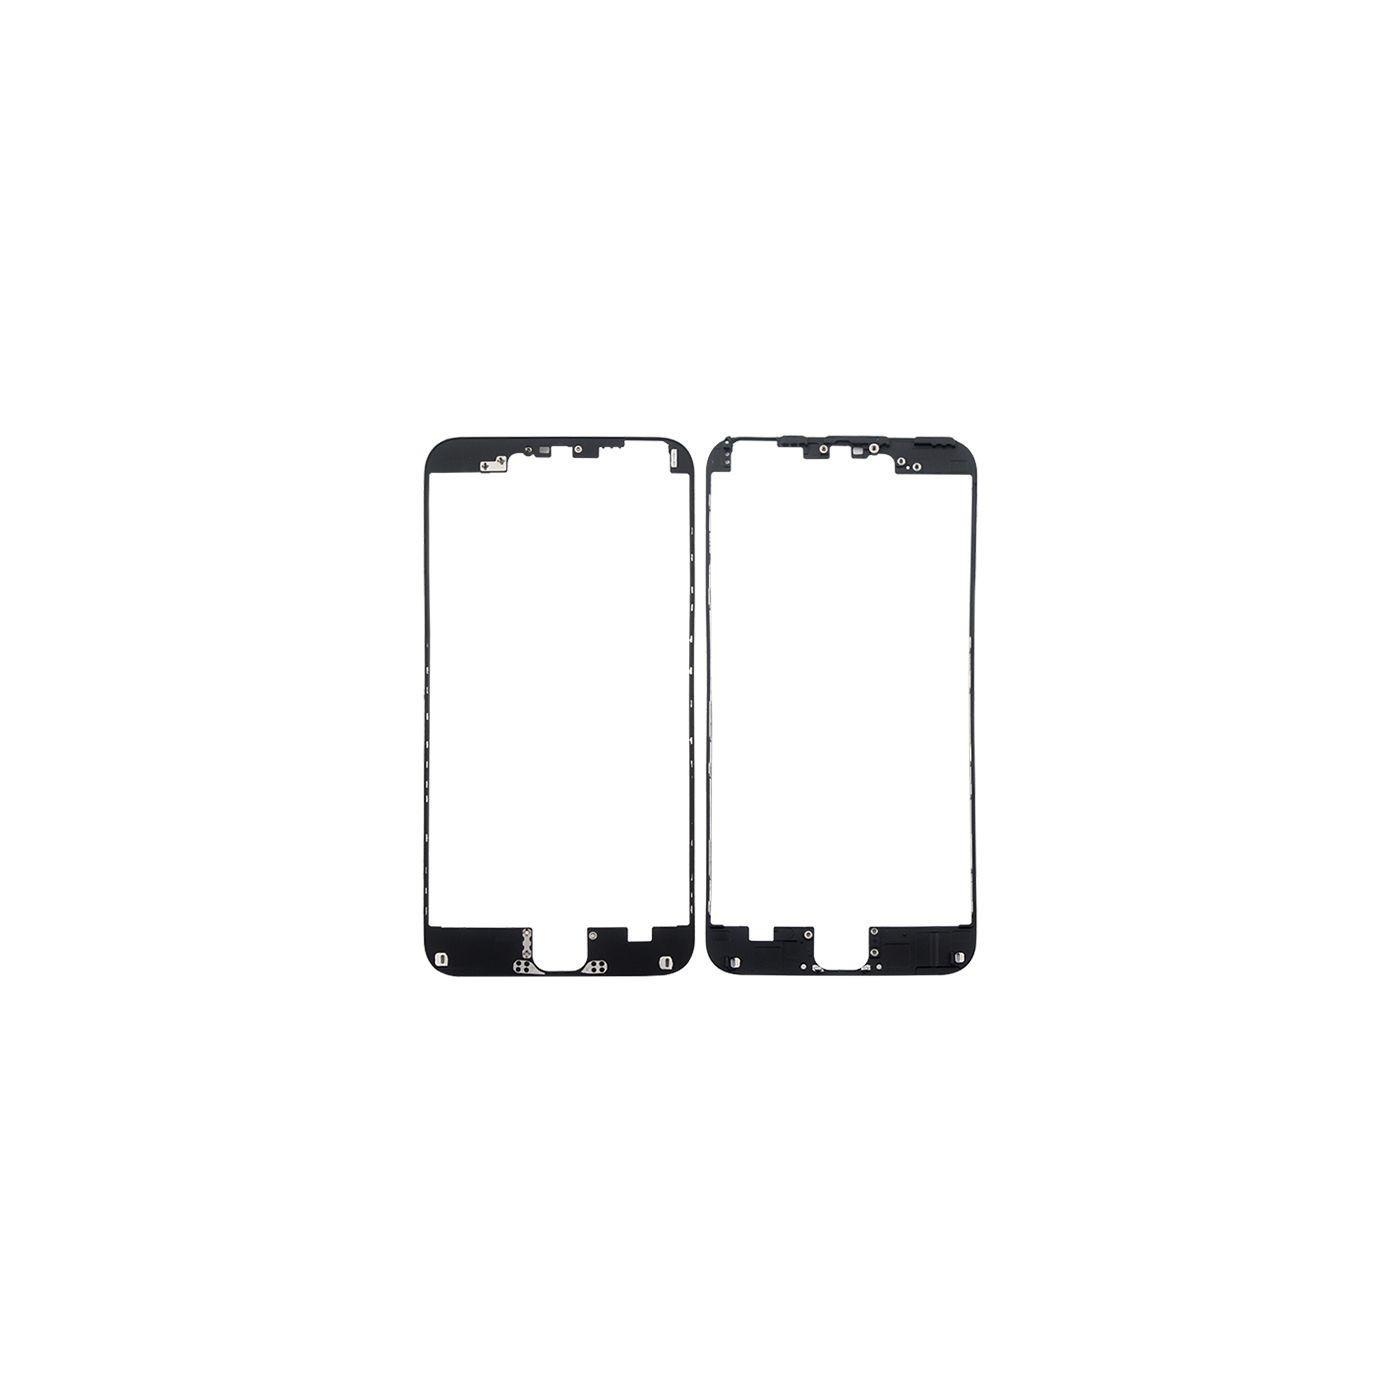 Marco digitalizador de fotograma para iphone 6 plus negro con etiqueta